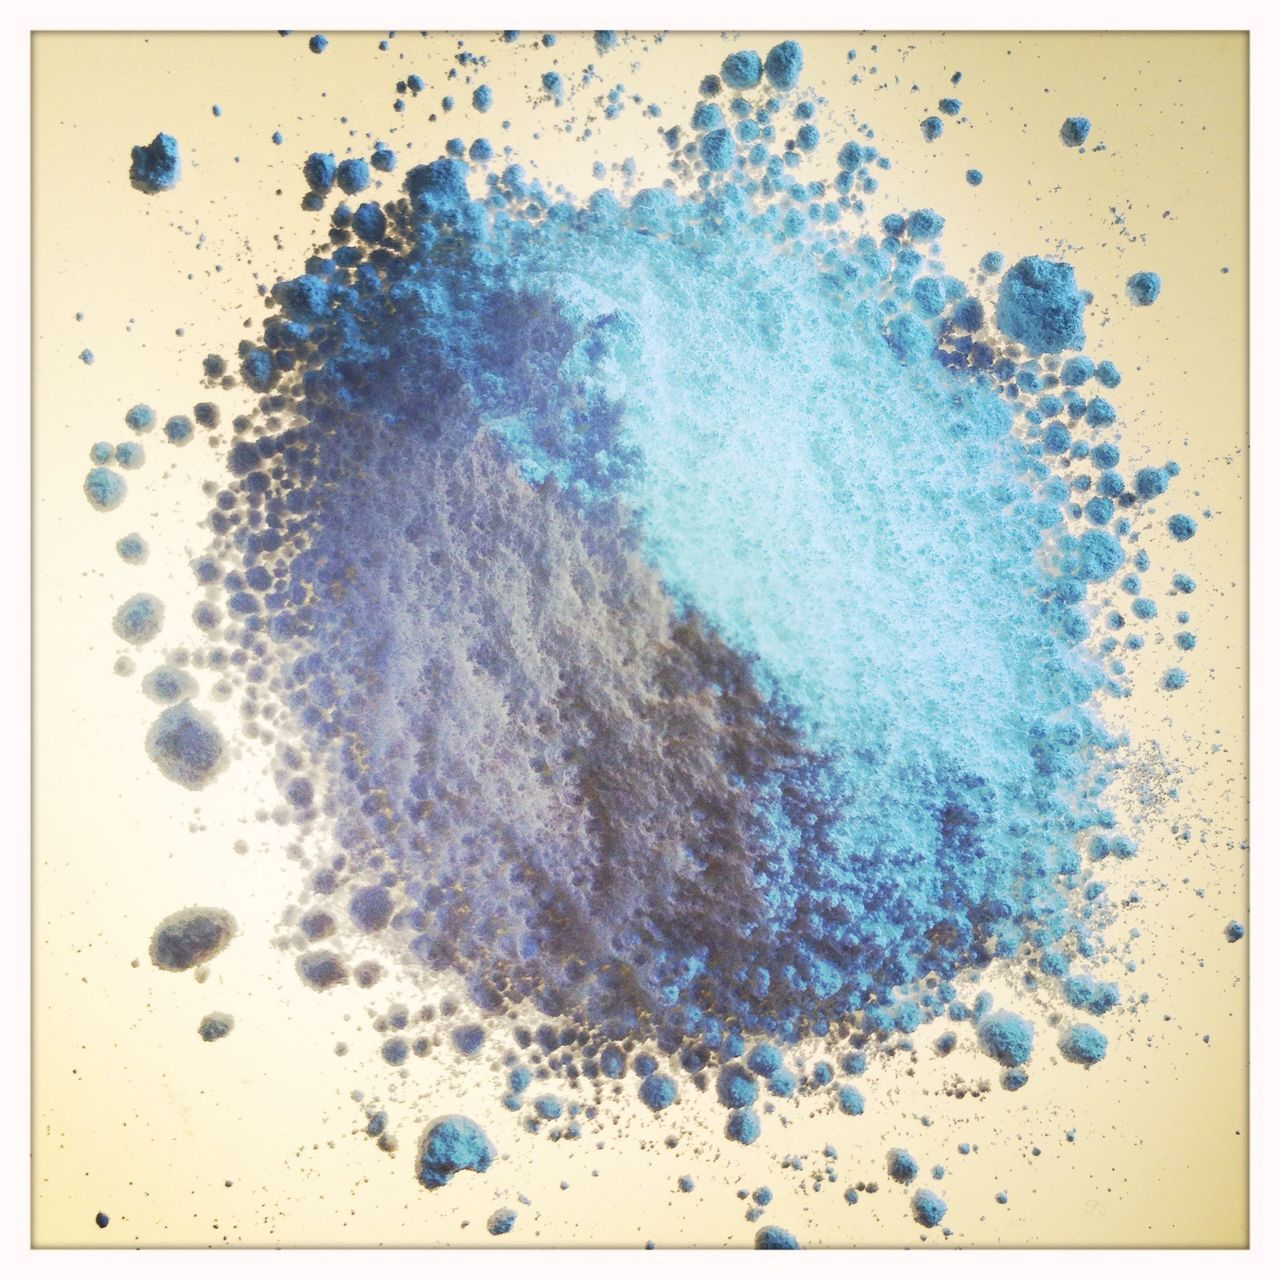 Zinc oxide powder Zinc Oxide Zinc Oxide Powder White Baby Powder Antiseptic Medicinal Pigments